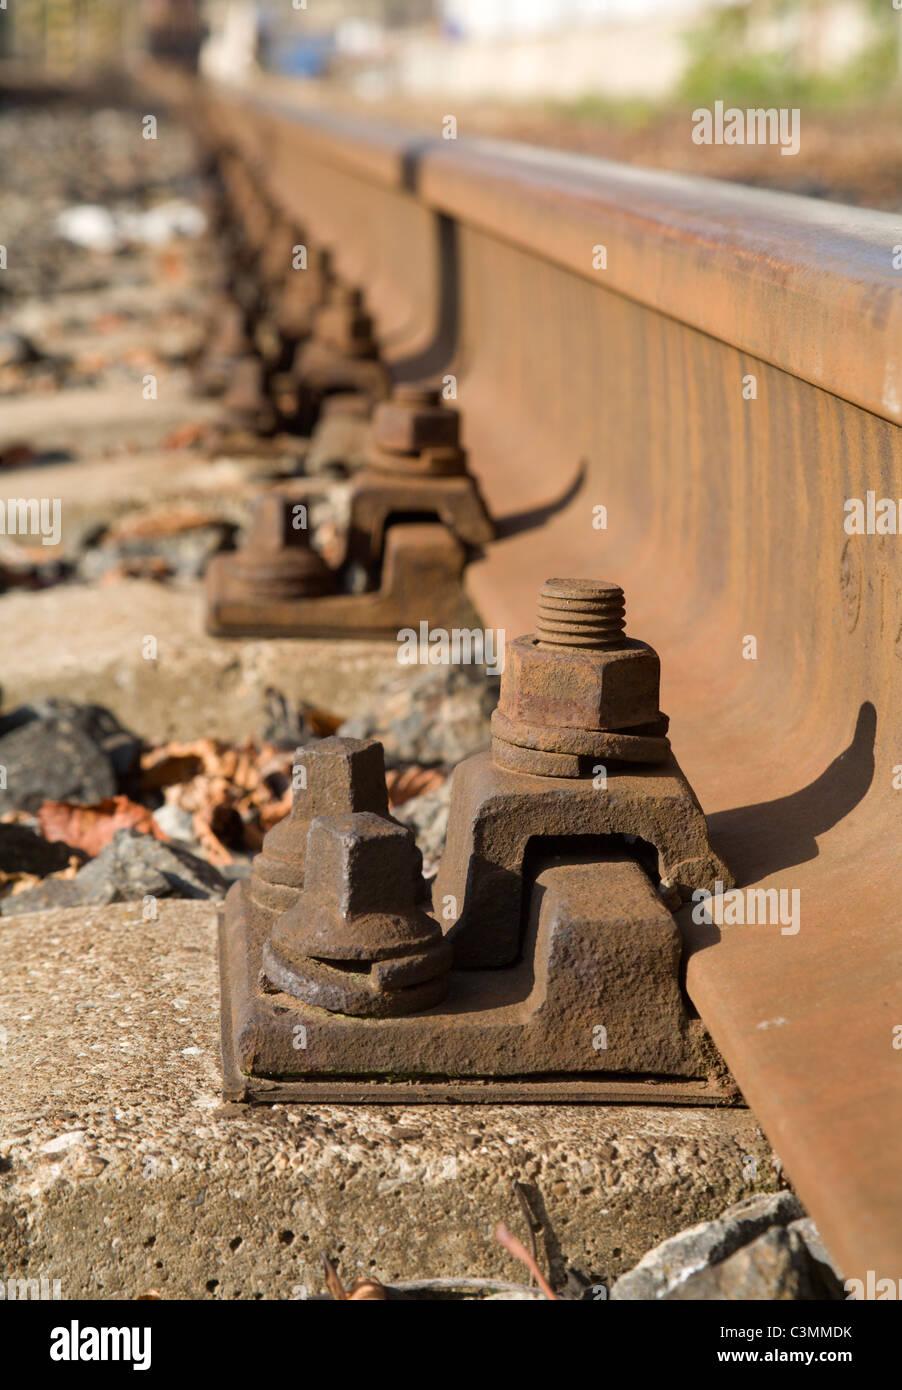 rails - detail - Stock Image